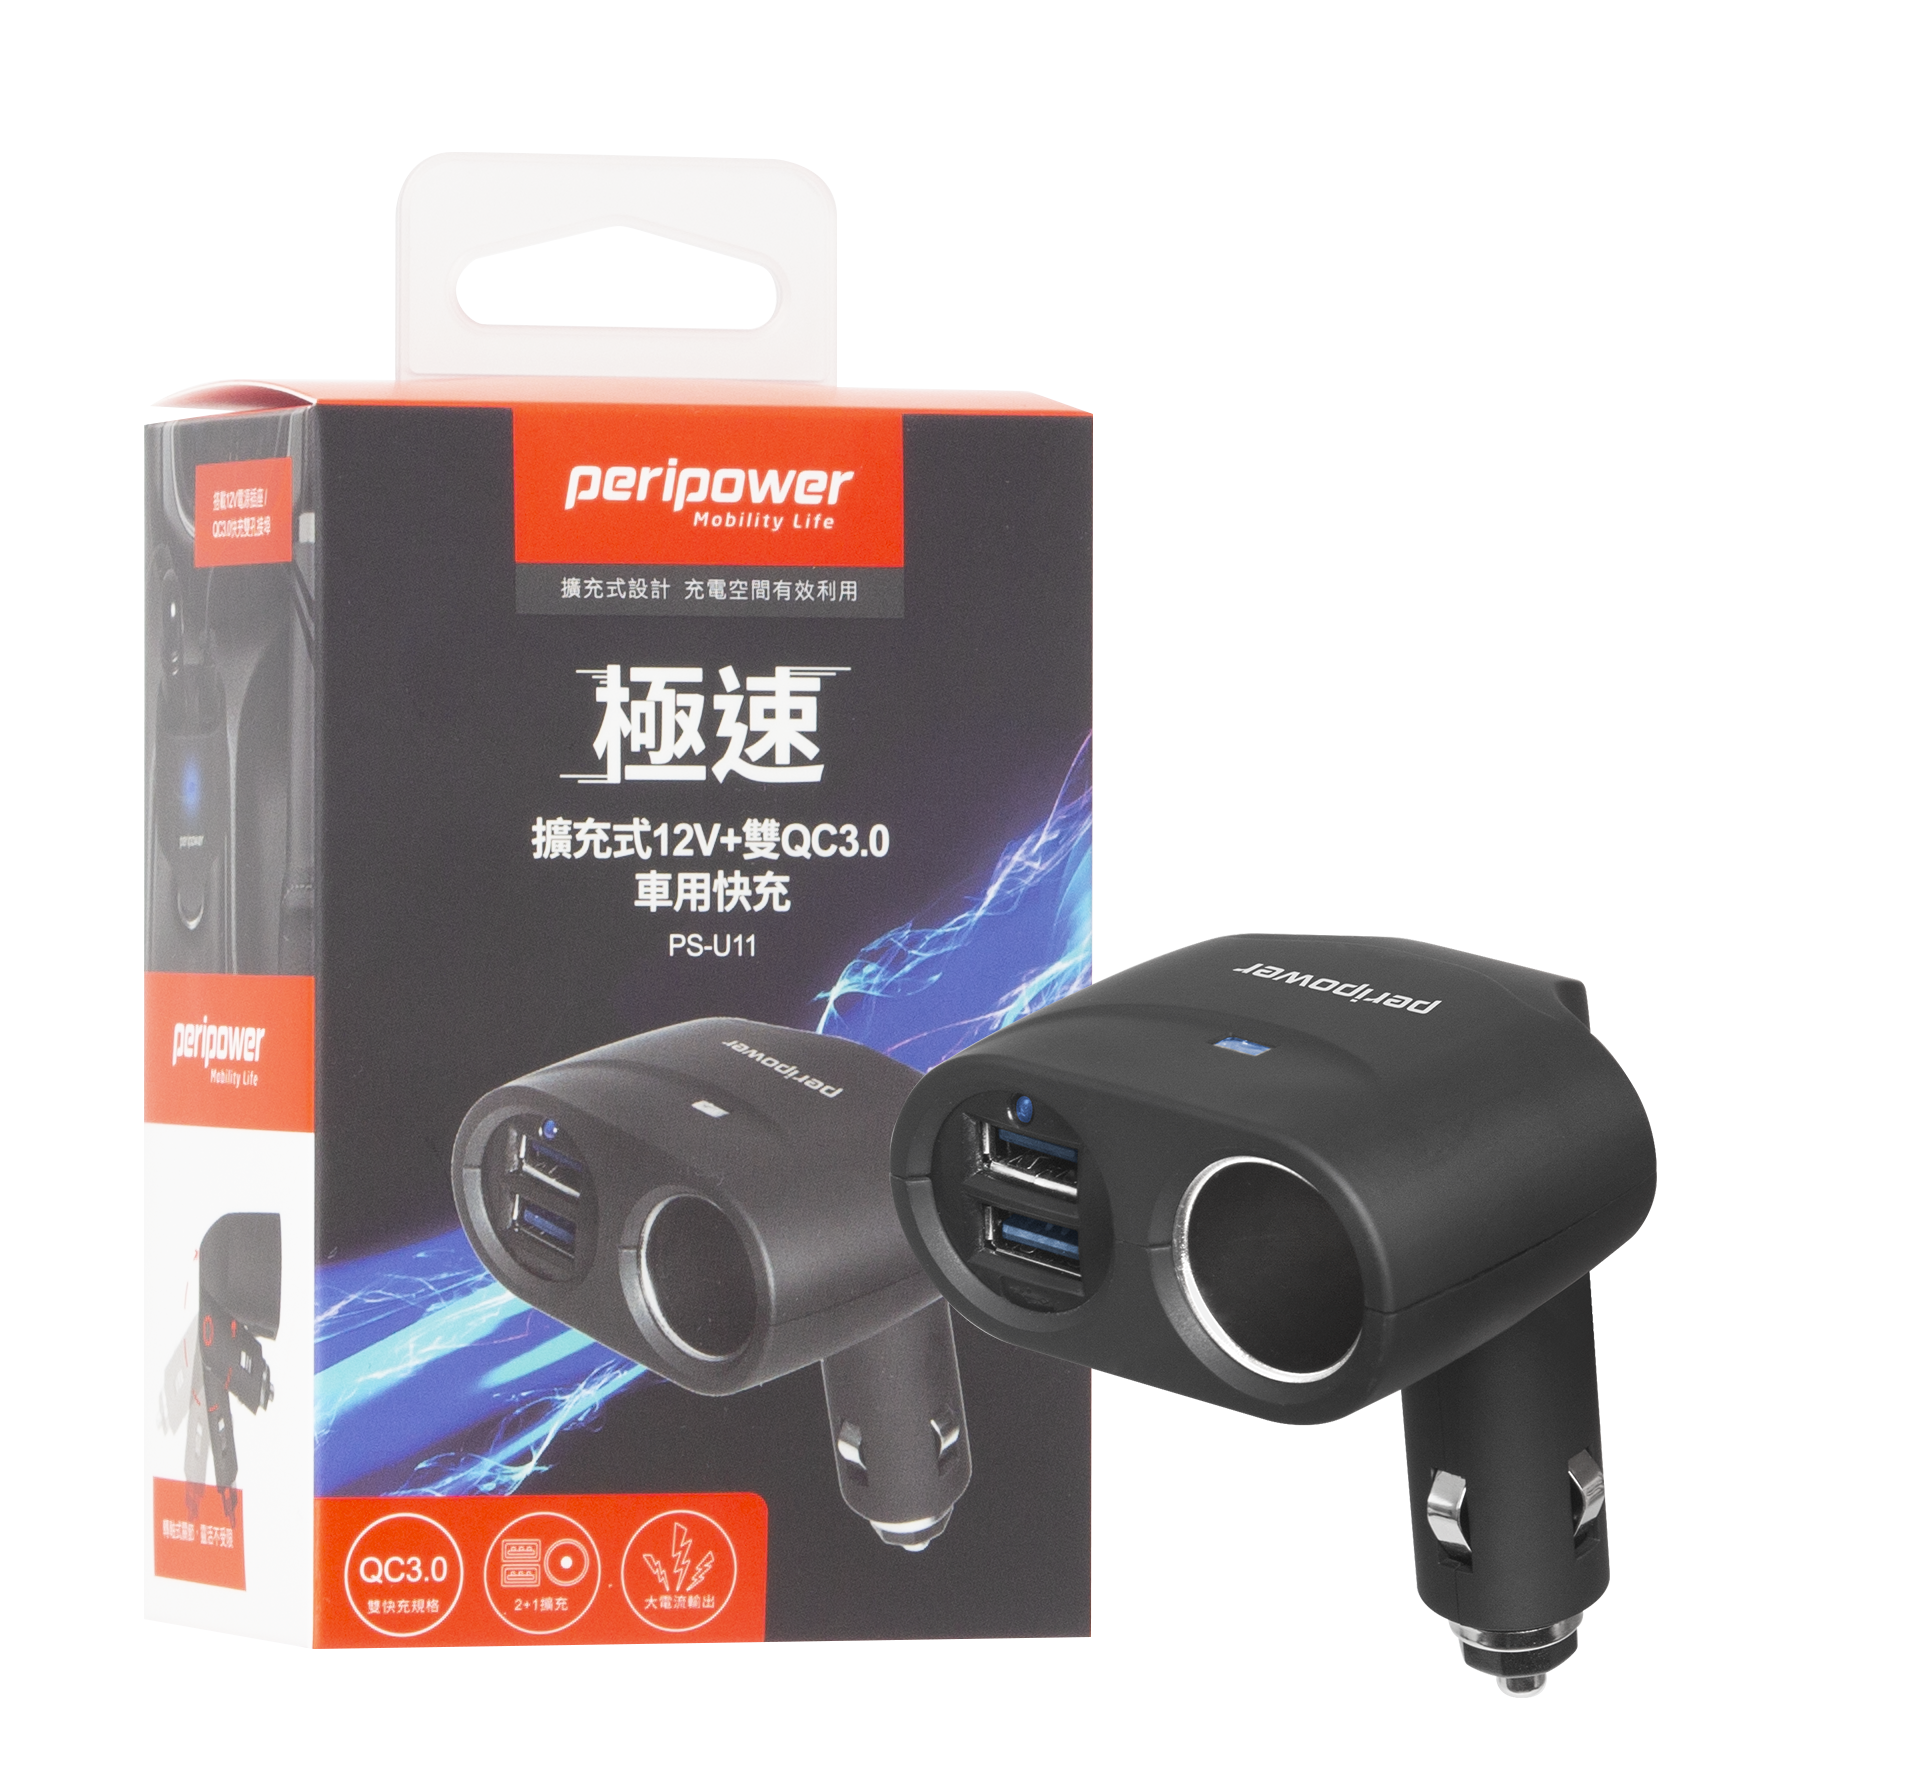 PS-U11 Lighter Socket Splitter with Dual Quick Charging USB Ports